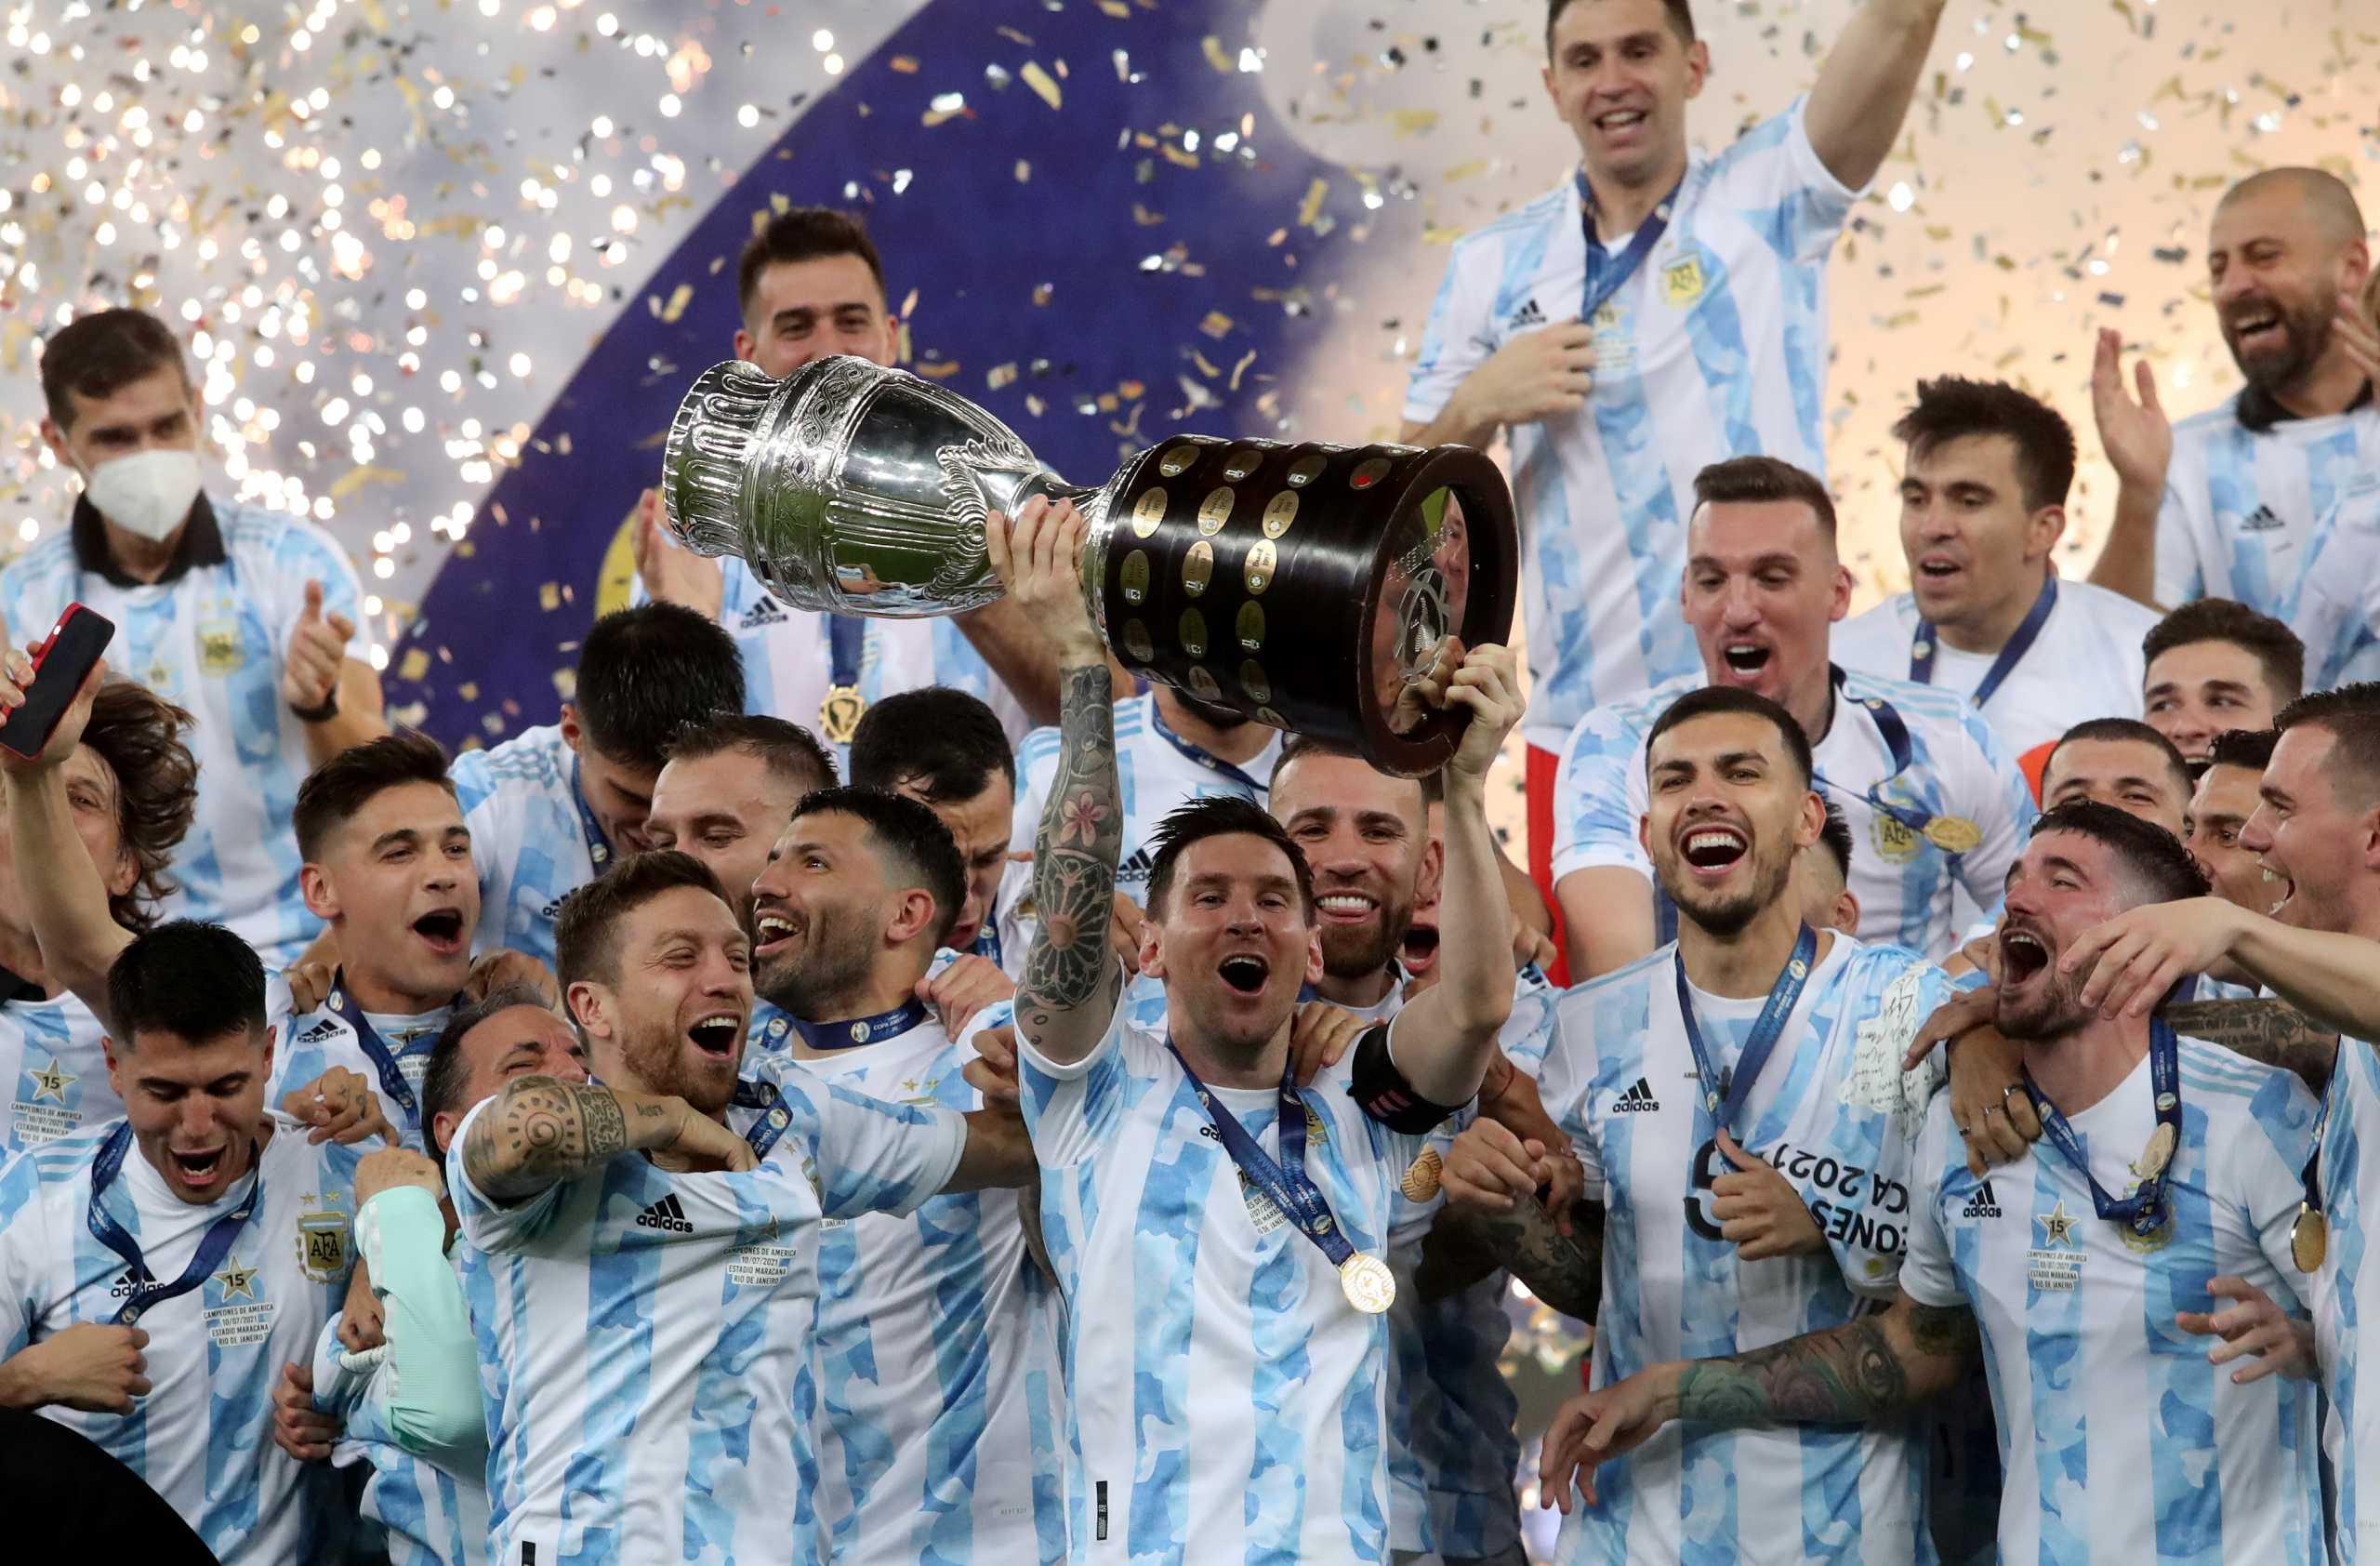 Copa America: Λύτρωση για την Αργεντινή! Νίκησε την Βραζιλία και κατέκτησε το τρόπαιο